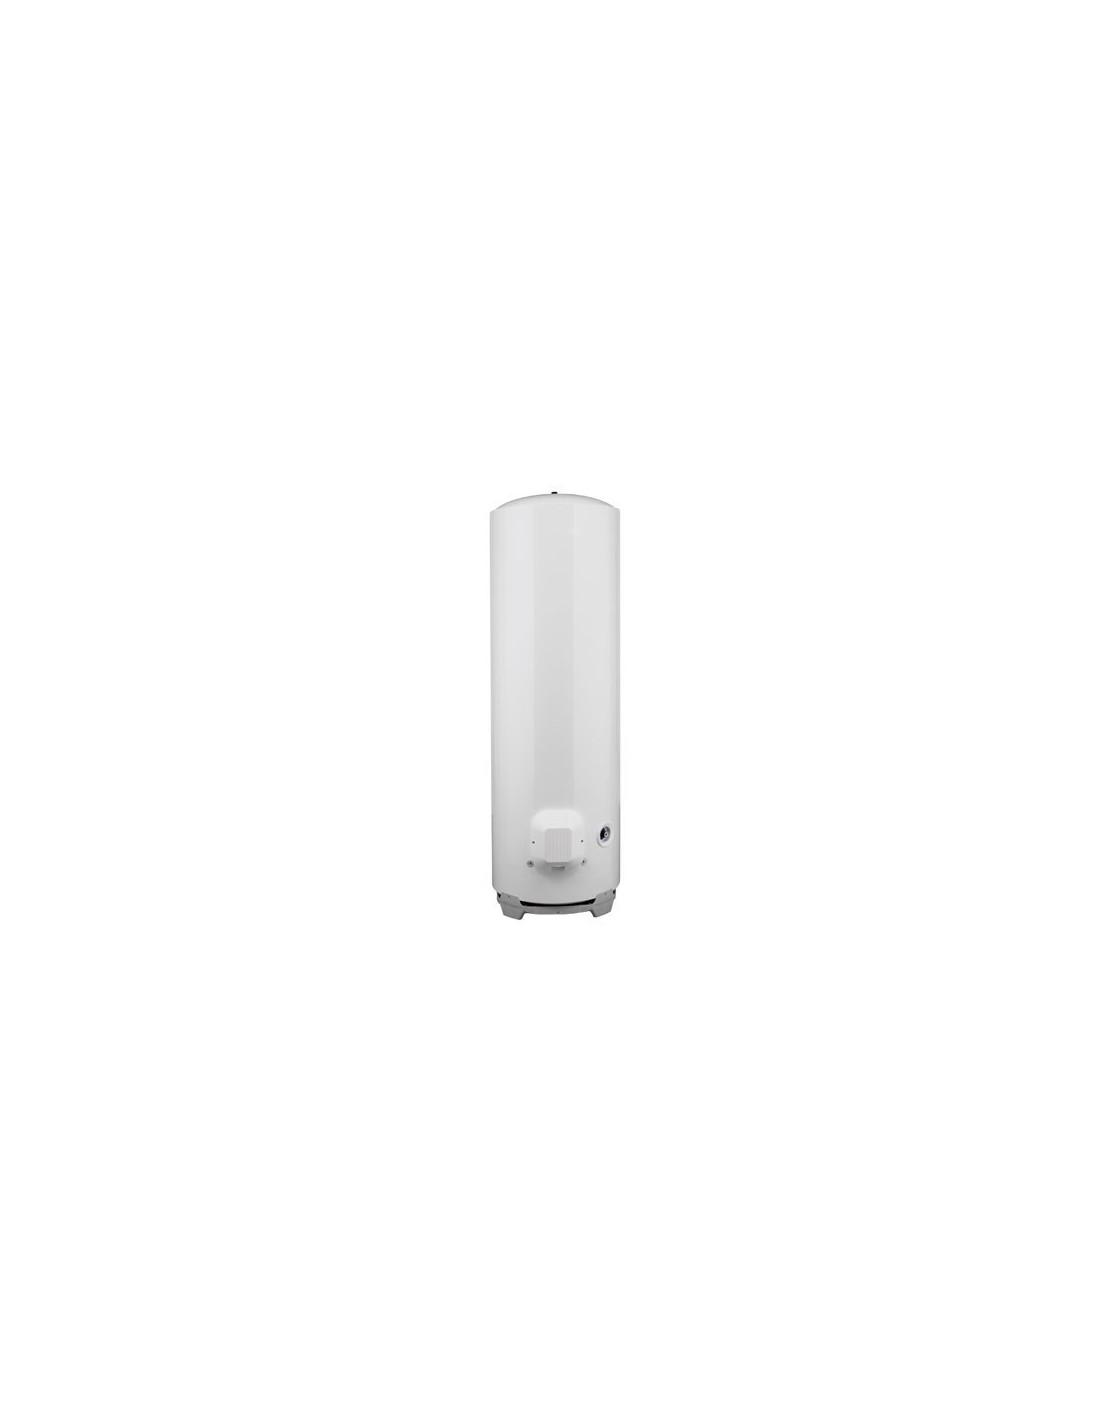 chauffe eau electr steatite stable 300l. Black Bedroom Furniture Sets. Home Design Ideas